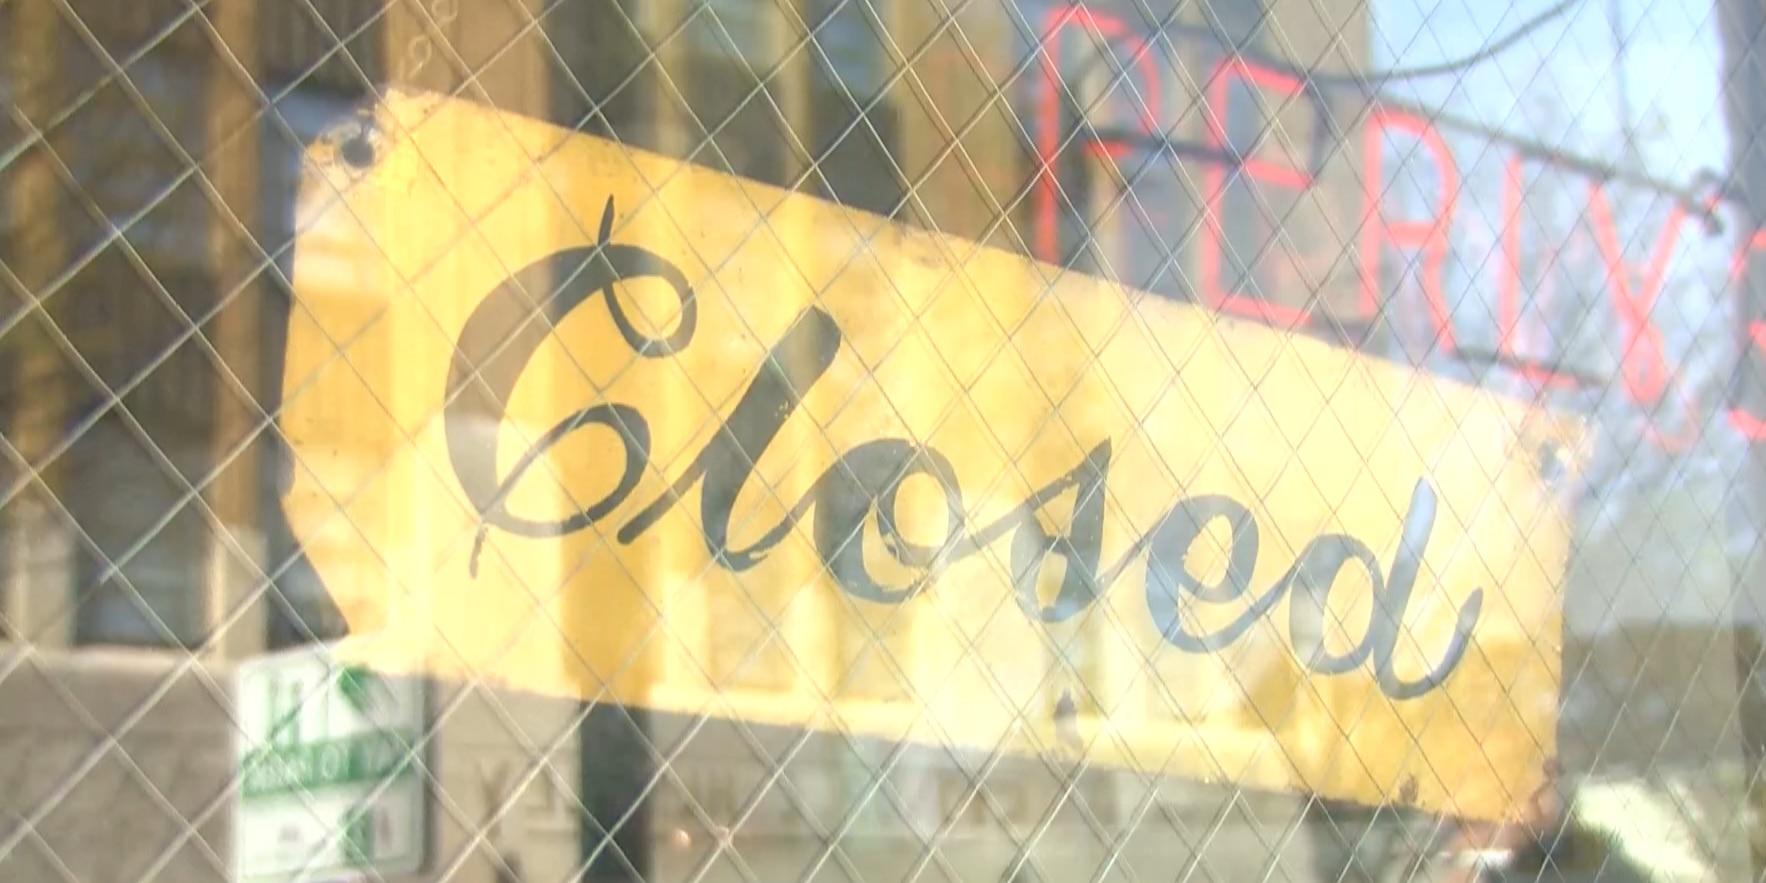 Restaurants, bars temporarily closing, changing operations due to coronavirus concerns